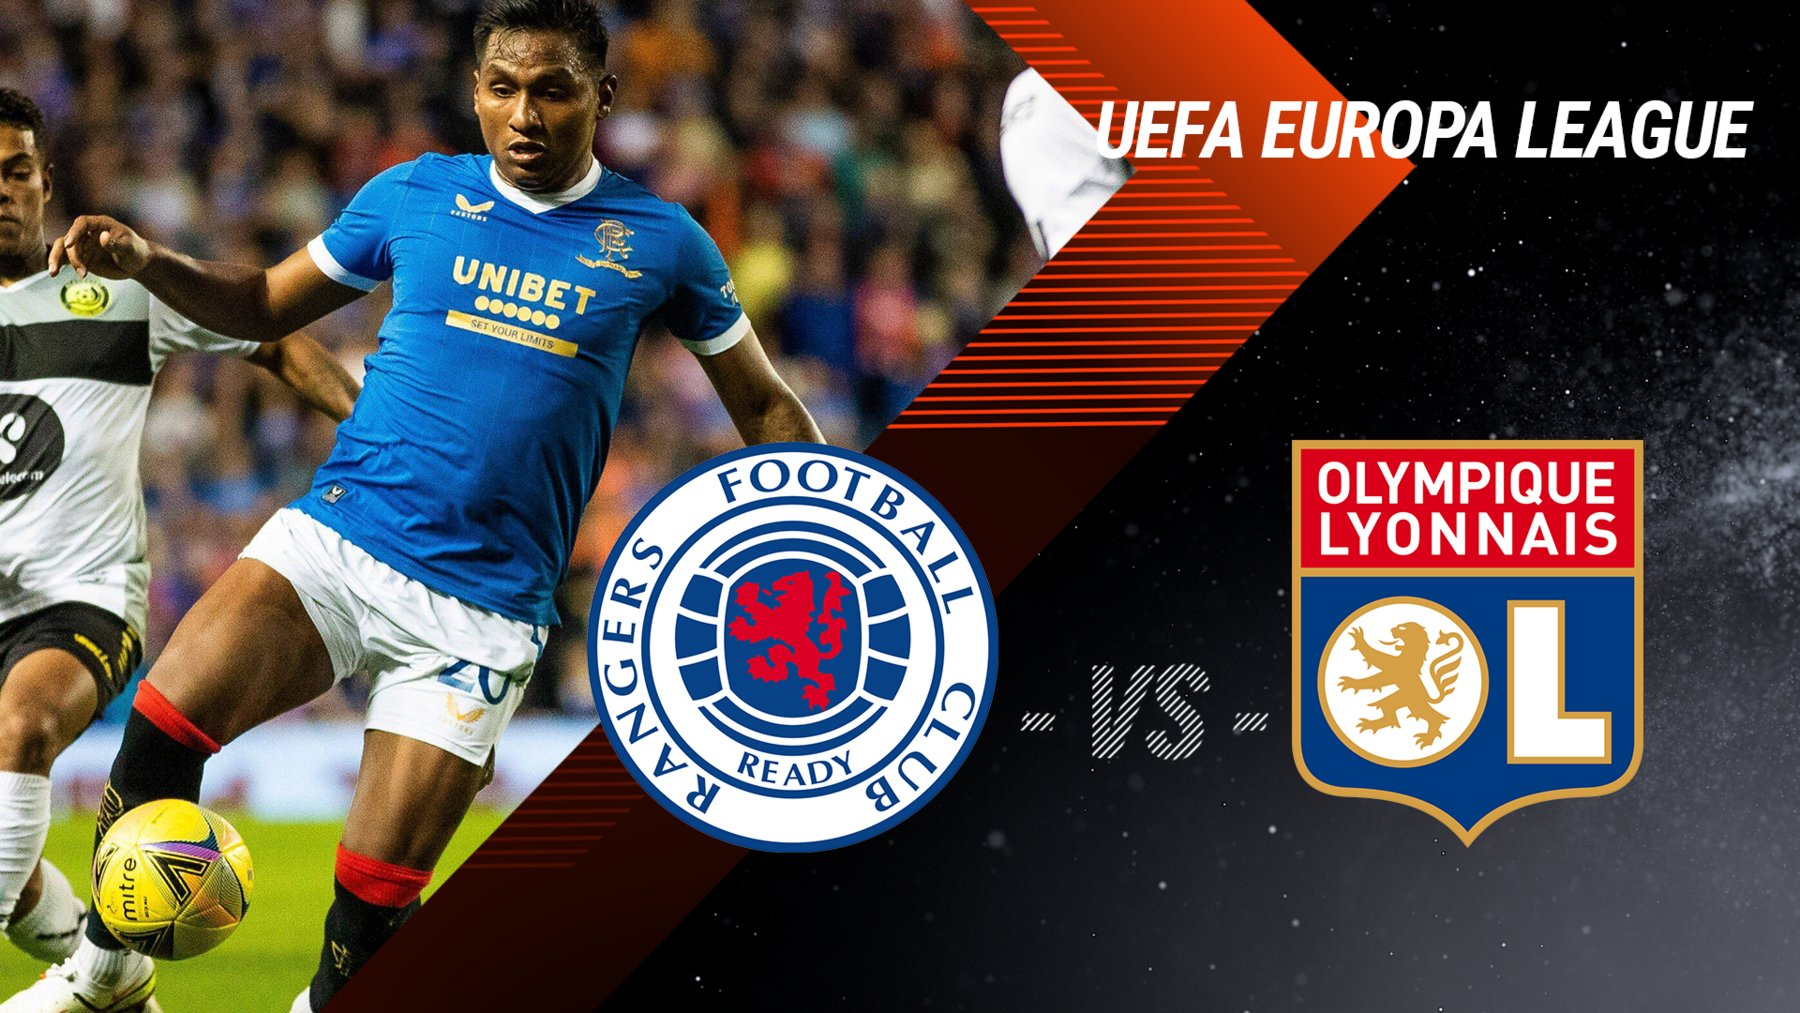 Glasgow Rangers vs. Olympique Lyon